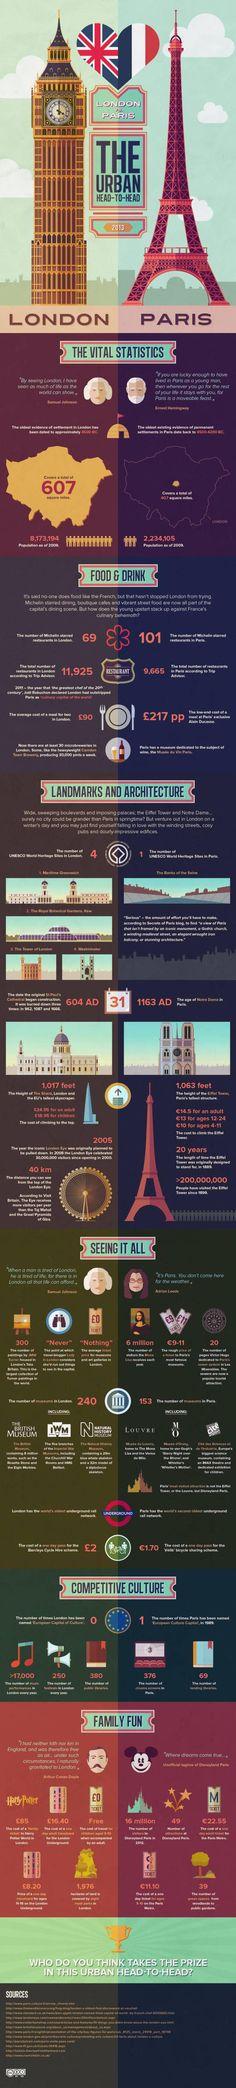 London vs Paris #infografia #infographic #tourism